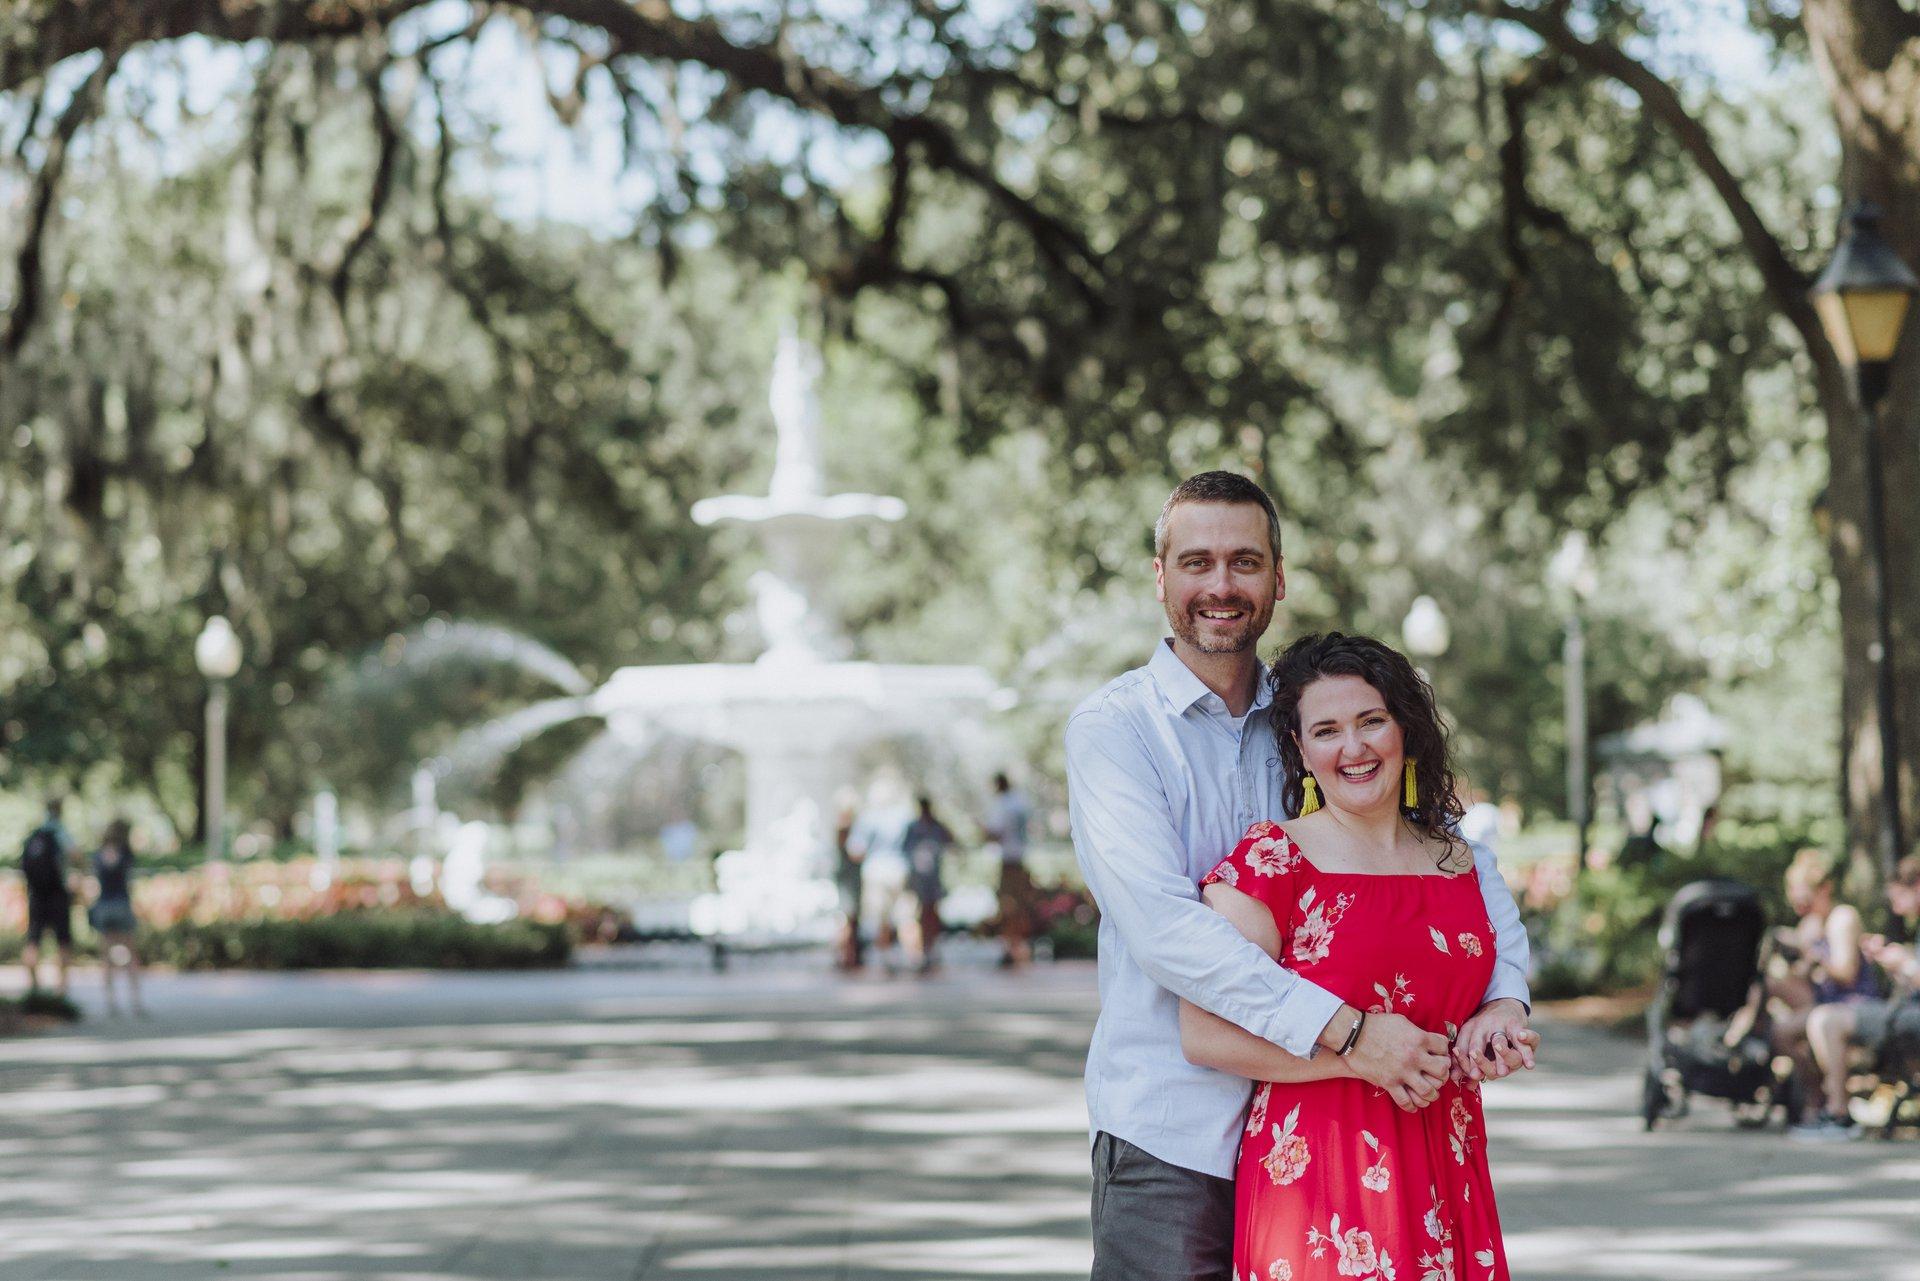 Savannah-United States-travel-story-Flytographer-21